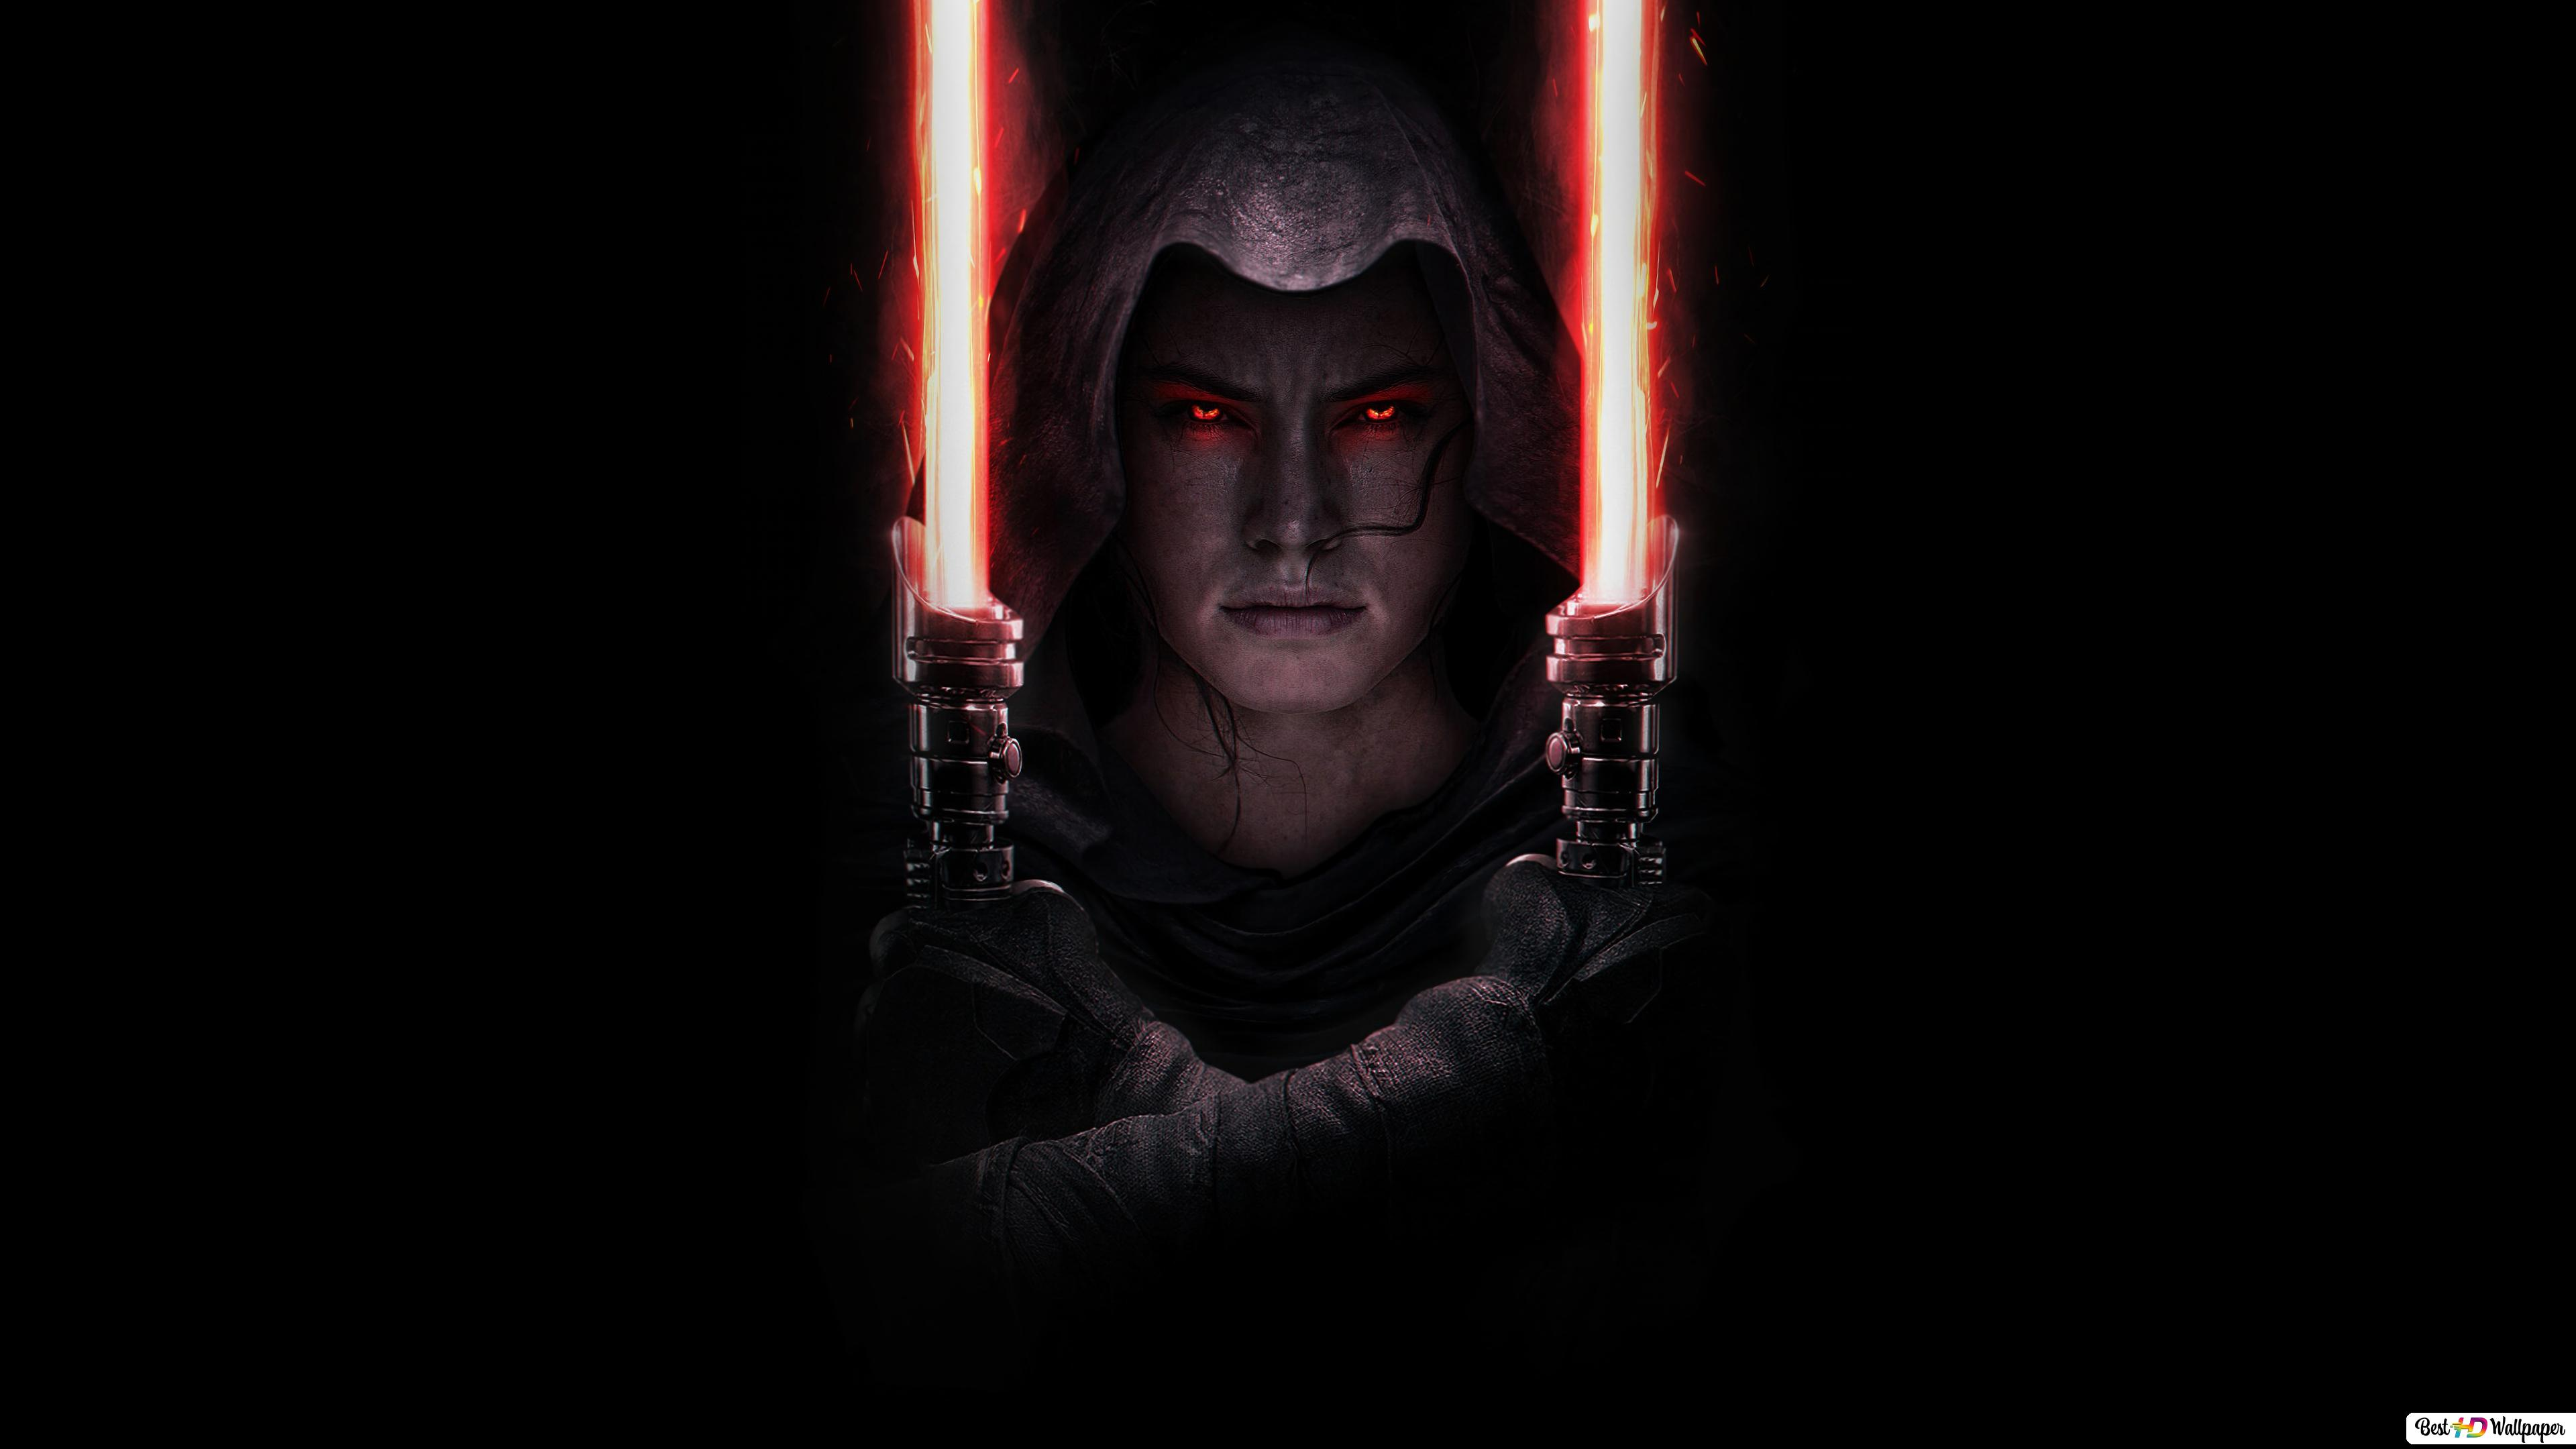 Rey Dark Side Star Wars 9 Hd Wallpaper Download